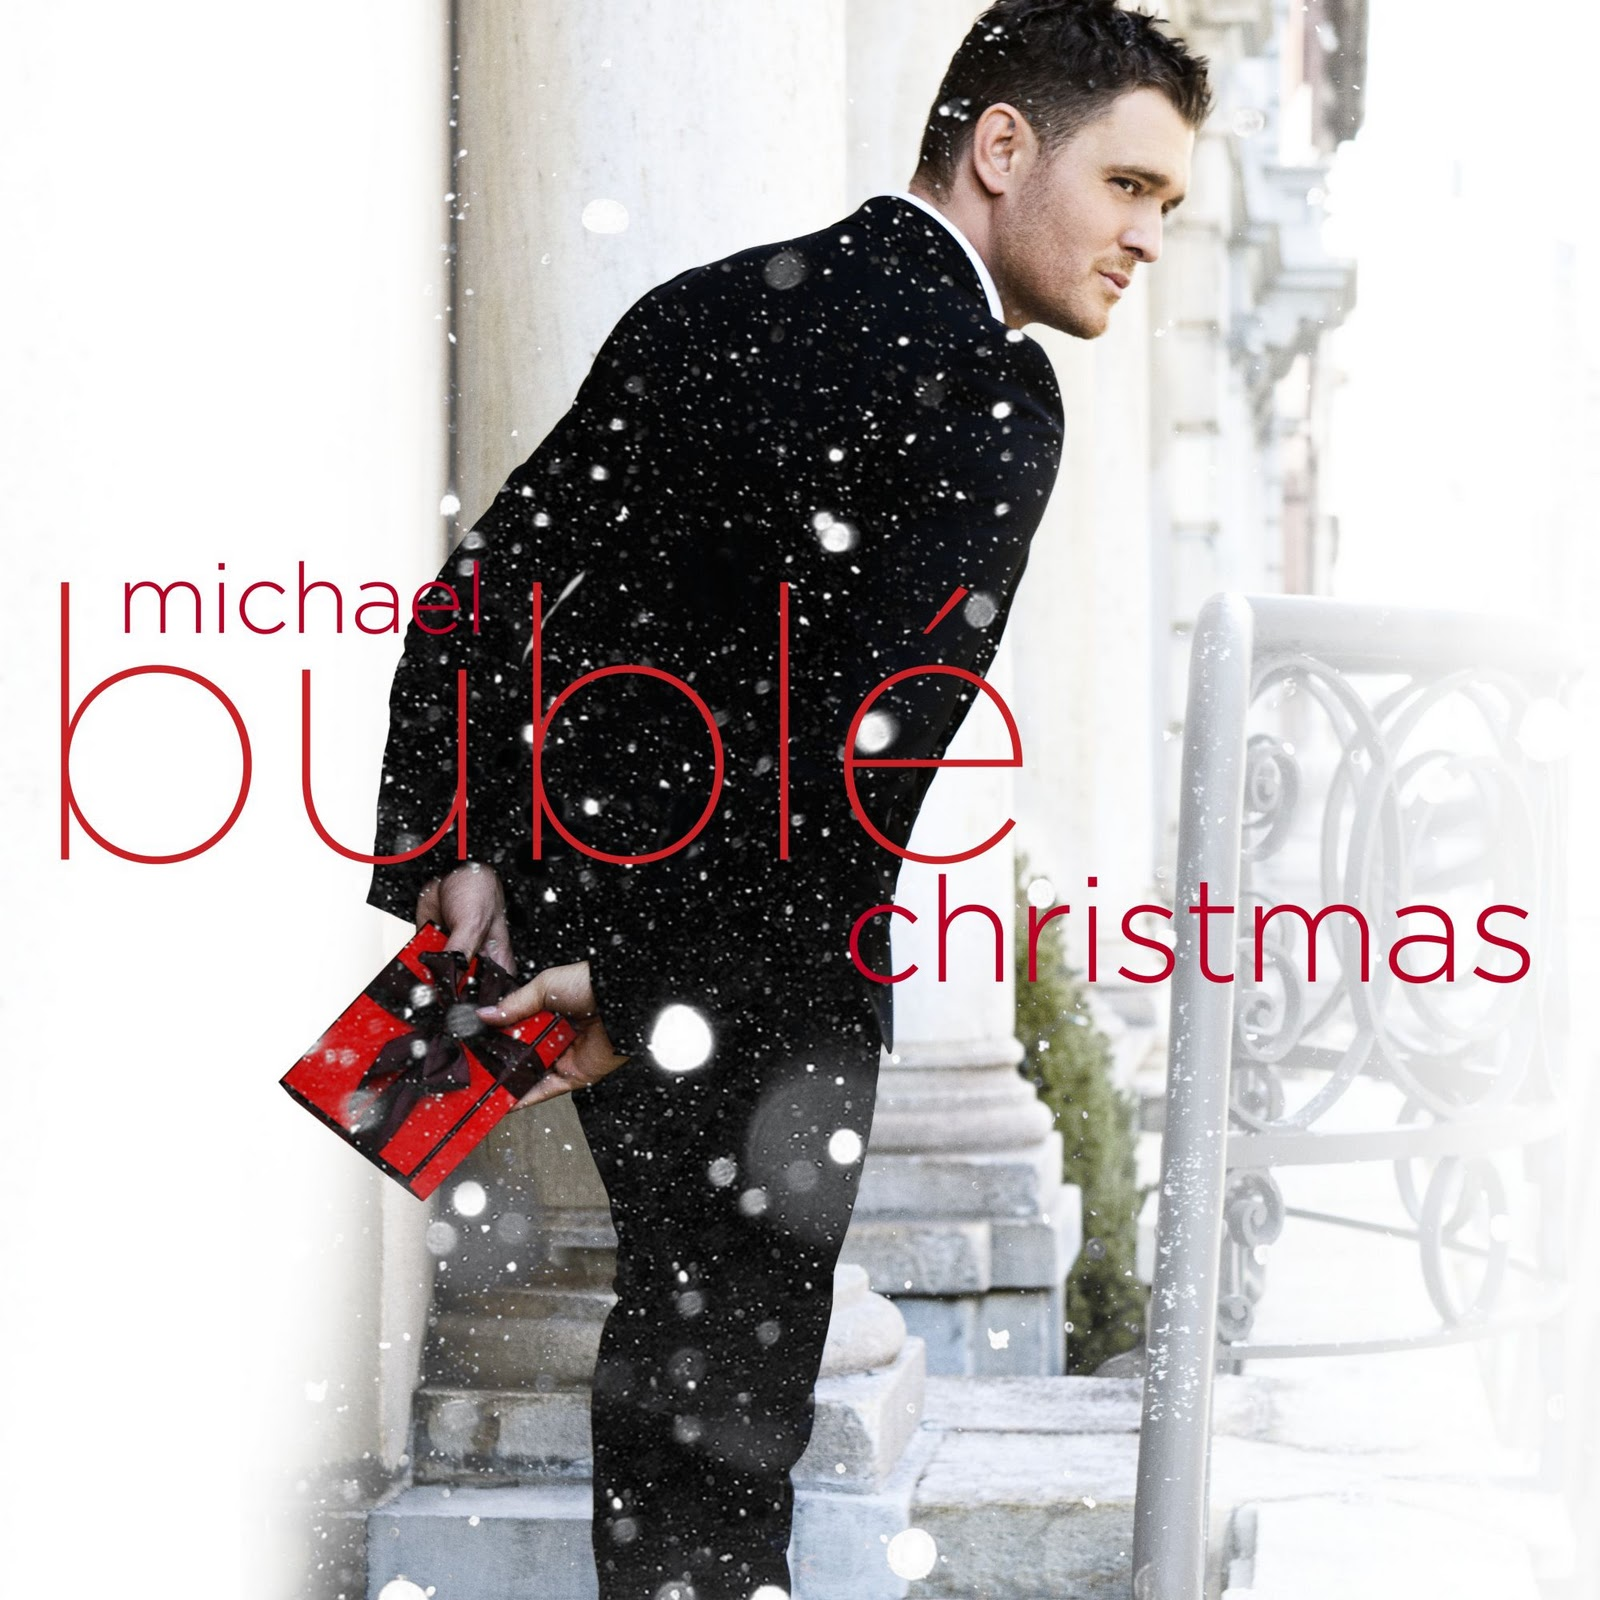 http://1.bp.blogspot.com/-HnoIAbwwXSo/TqWLGynHdwI/AAAAAAAAG28/L_qxDedXG84/s1600/christmas--cover-art-extralarge_1313541716823.jpg